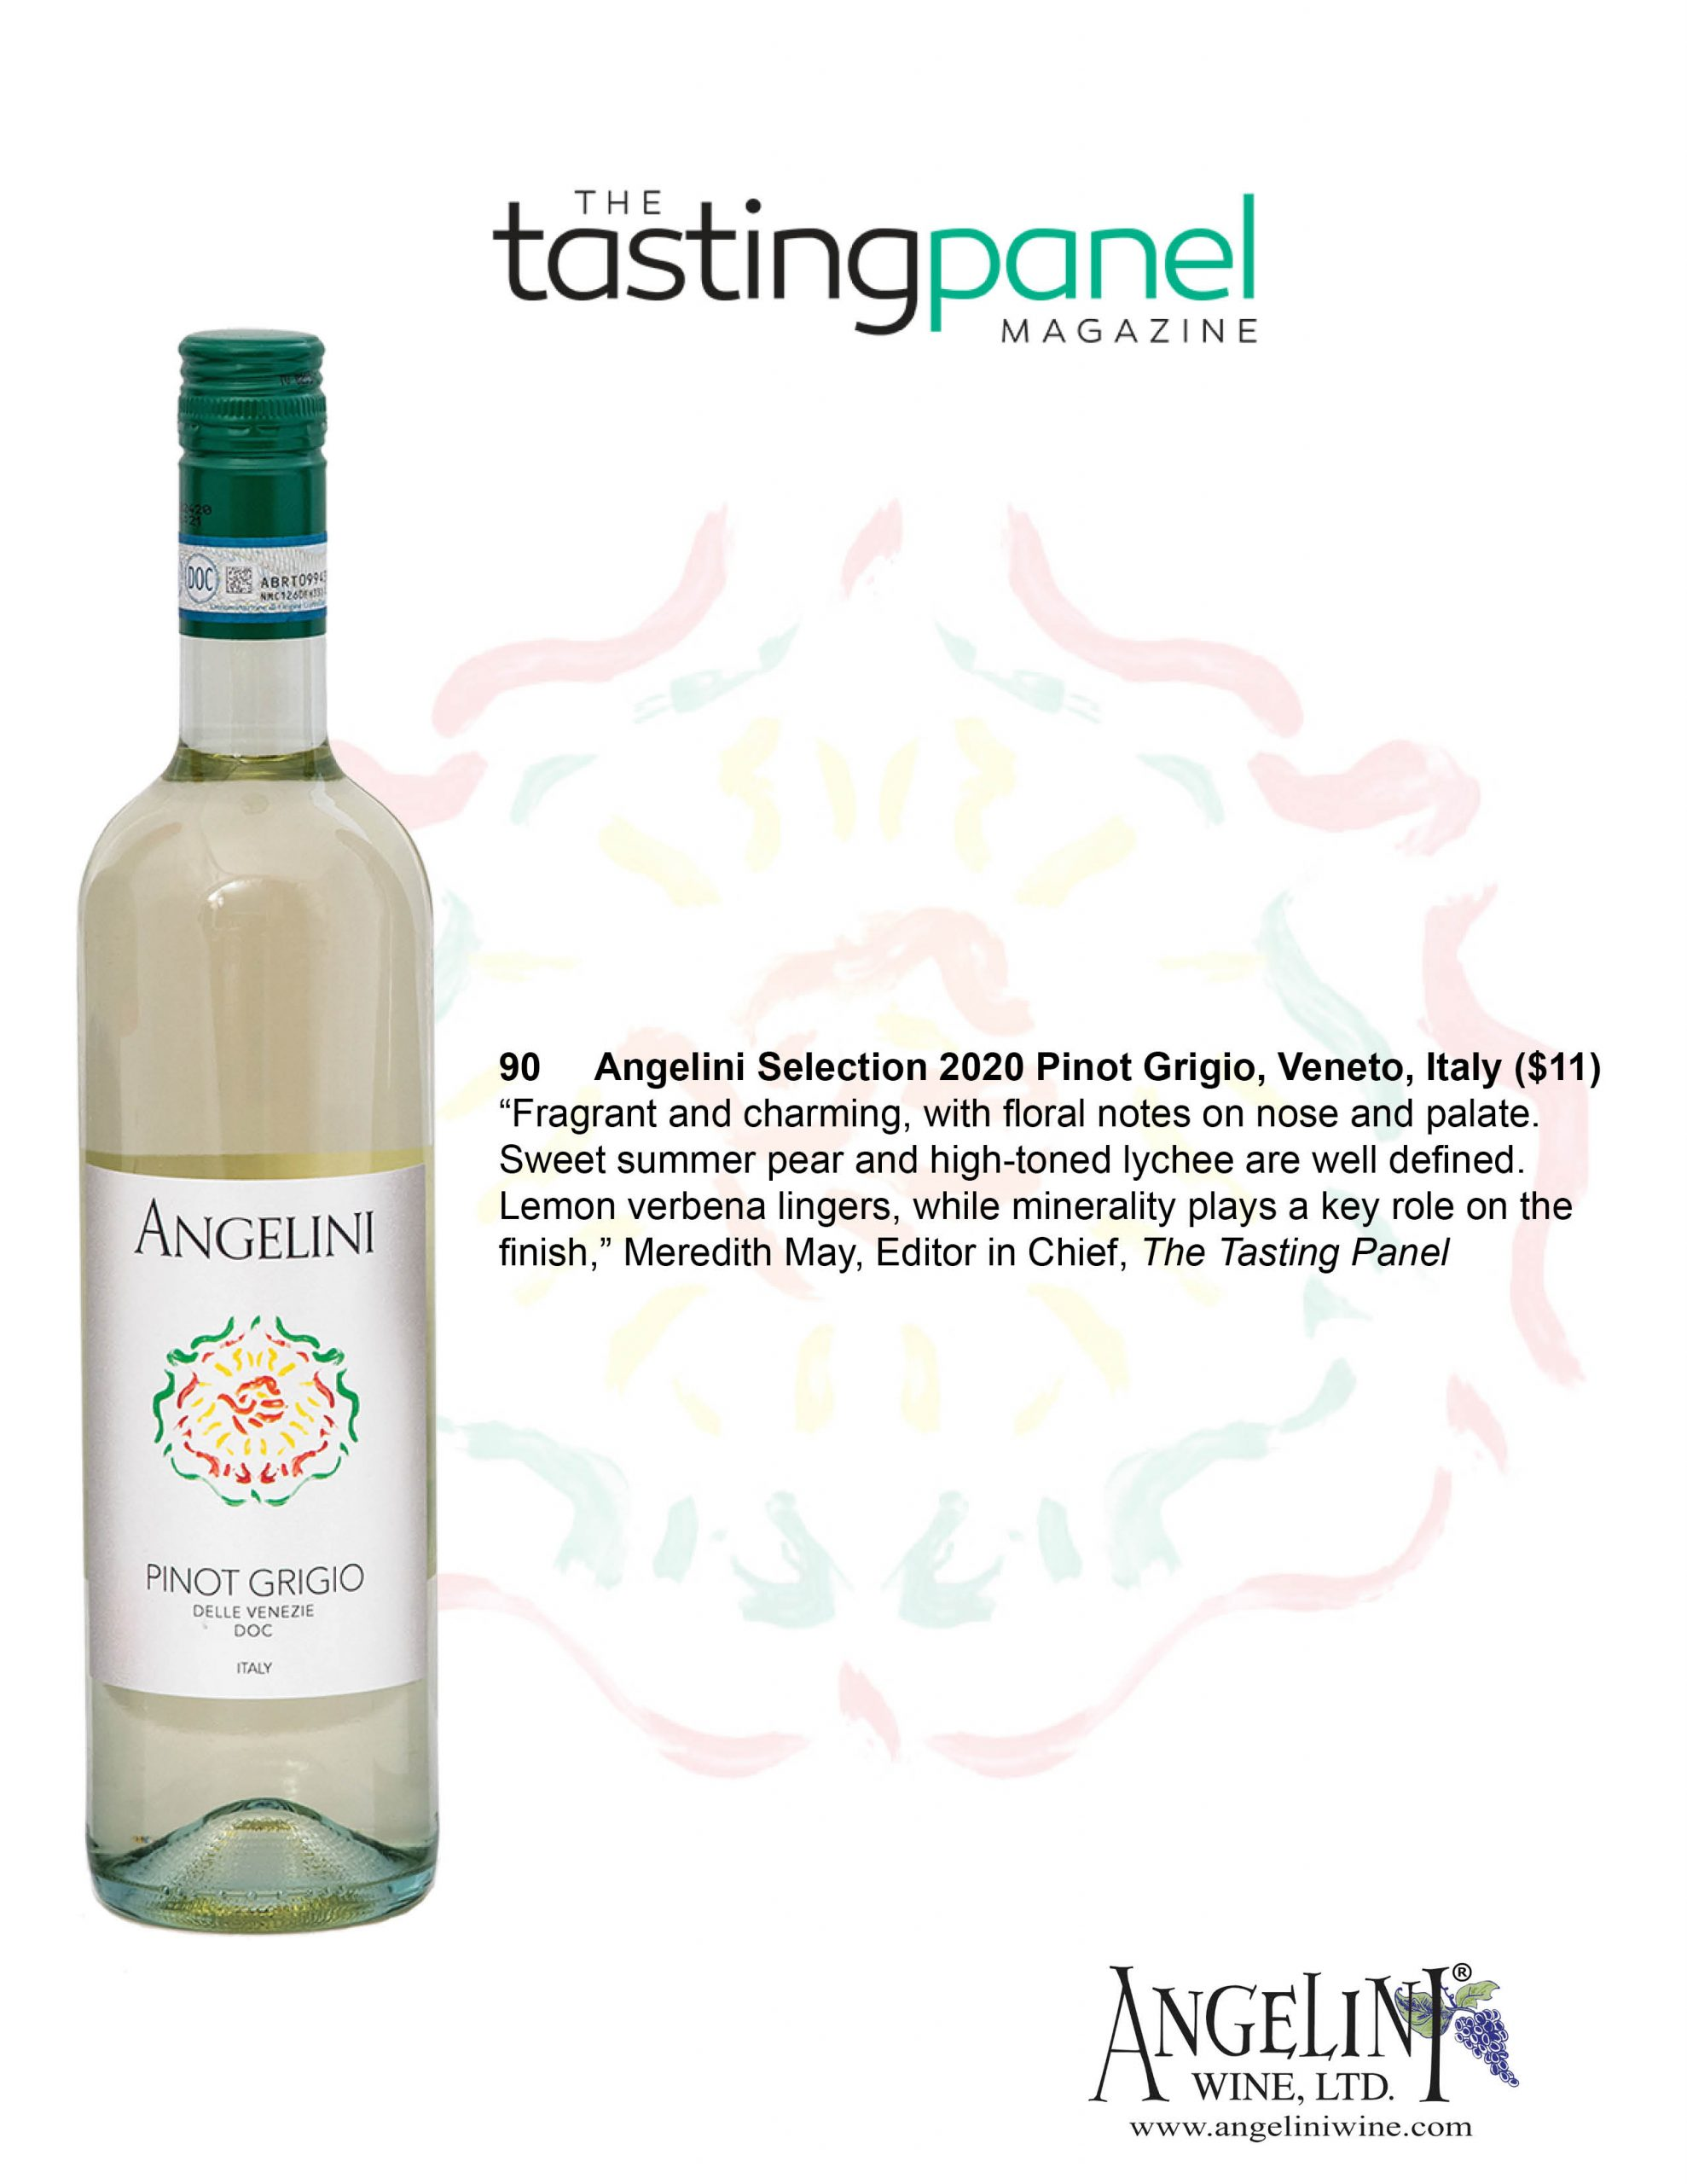 https://www.angeliniwine.com/wp-content/uploads/2021/05/Angelini-Pinot-Grigio-The-Tasting-Panel-Magazine-90-scaled.jpg